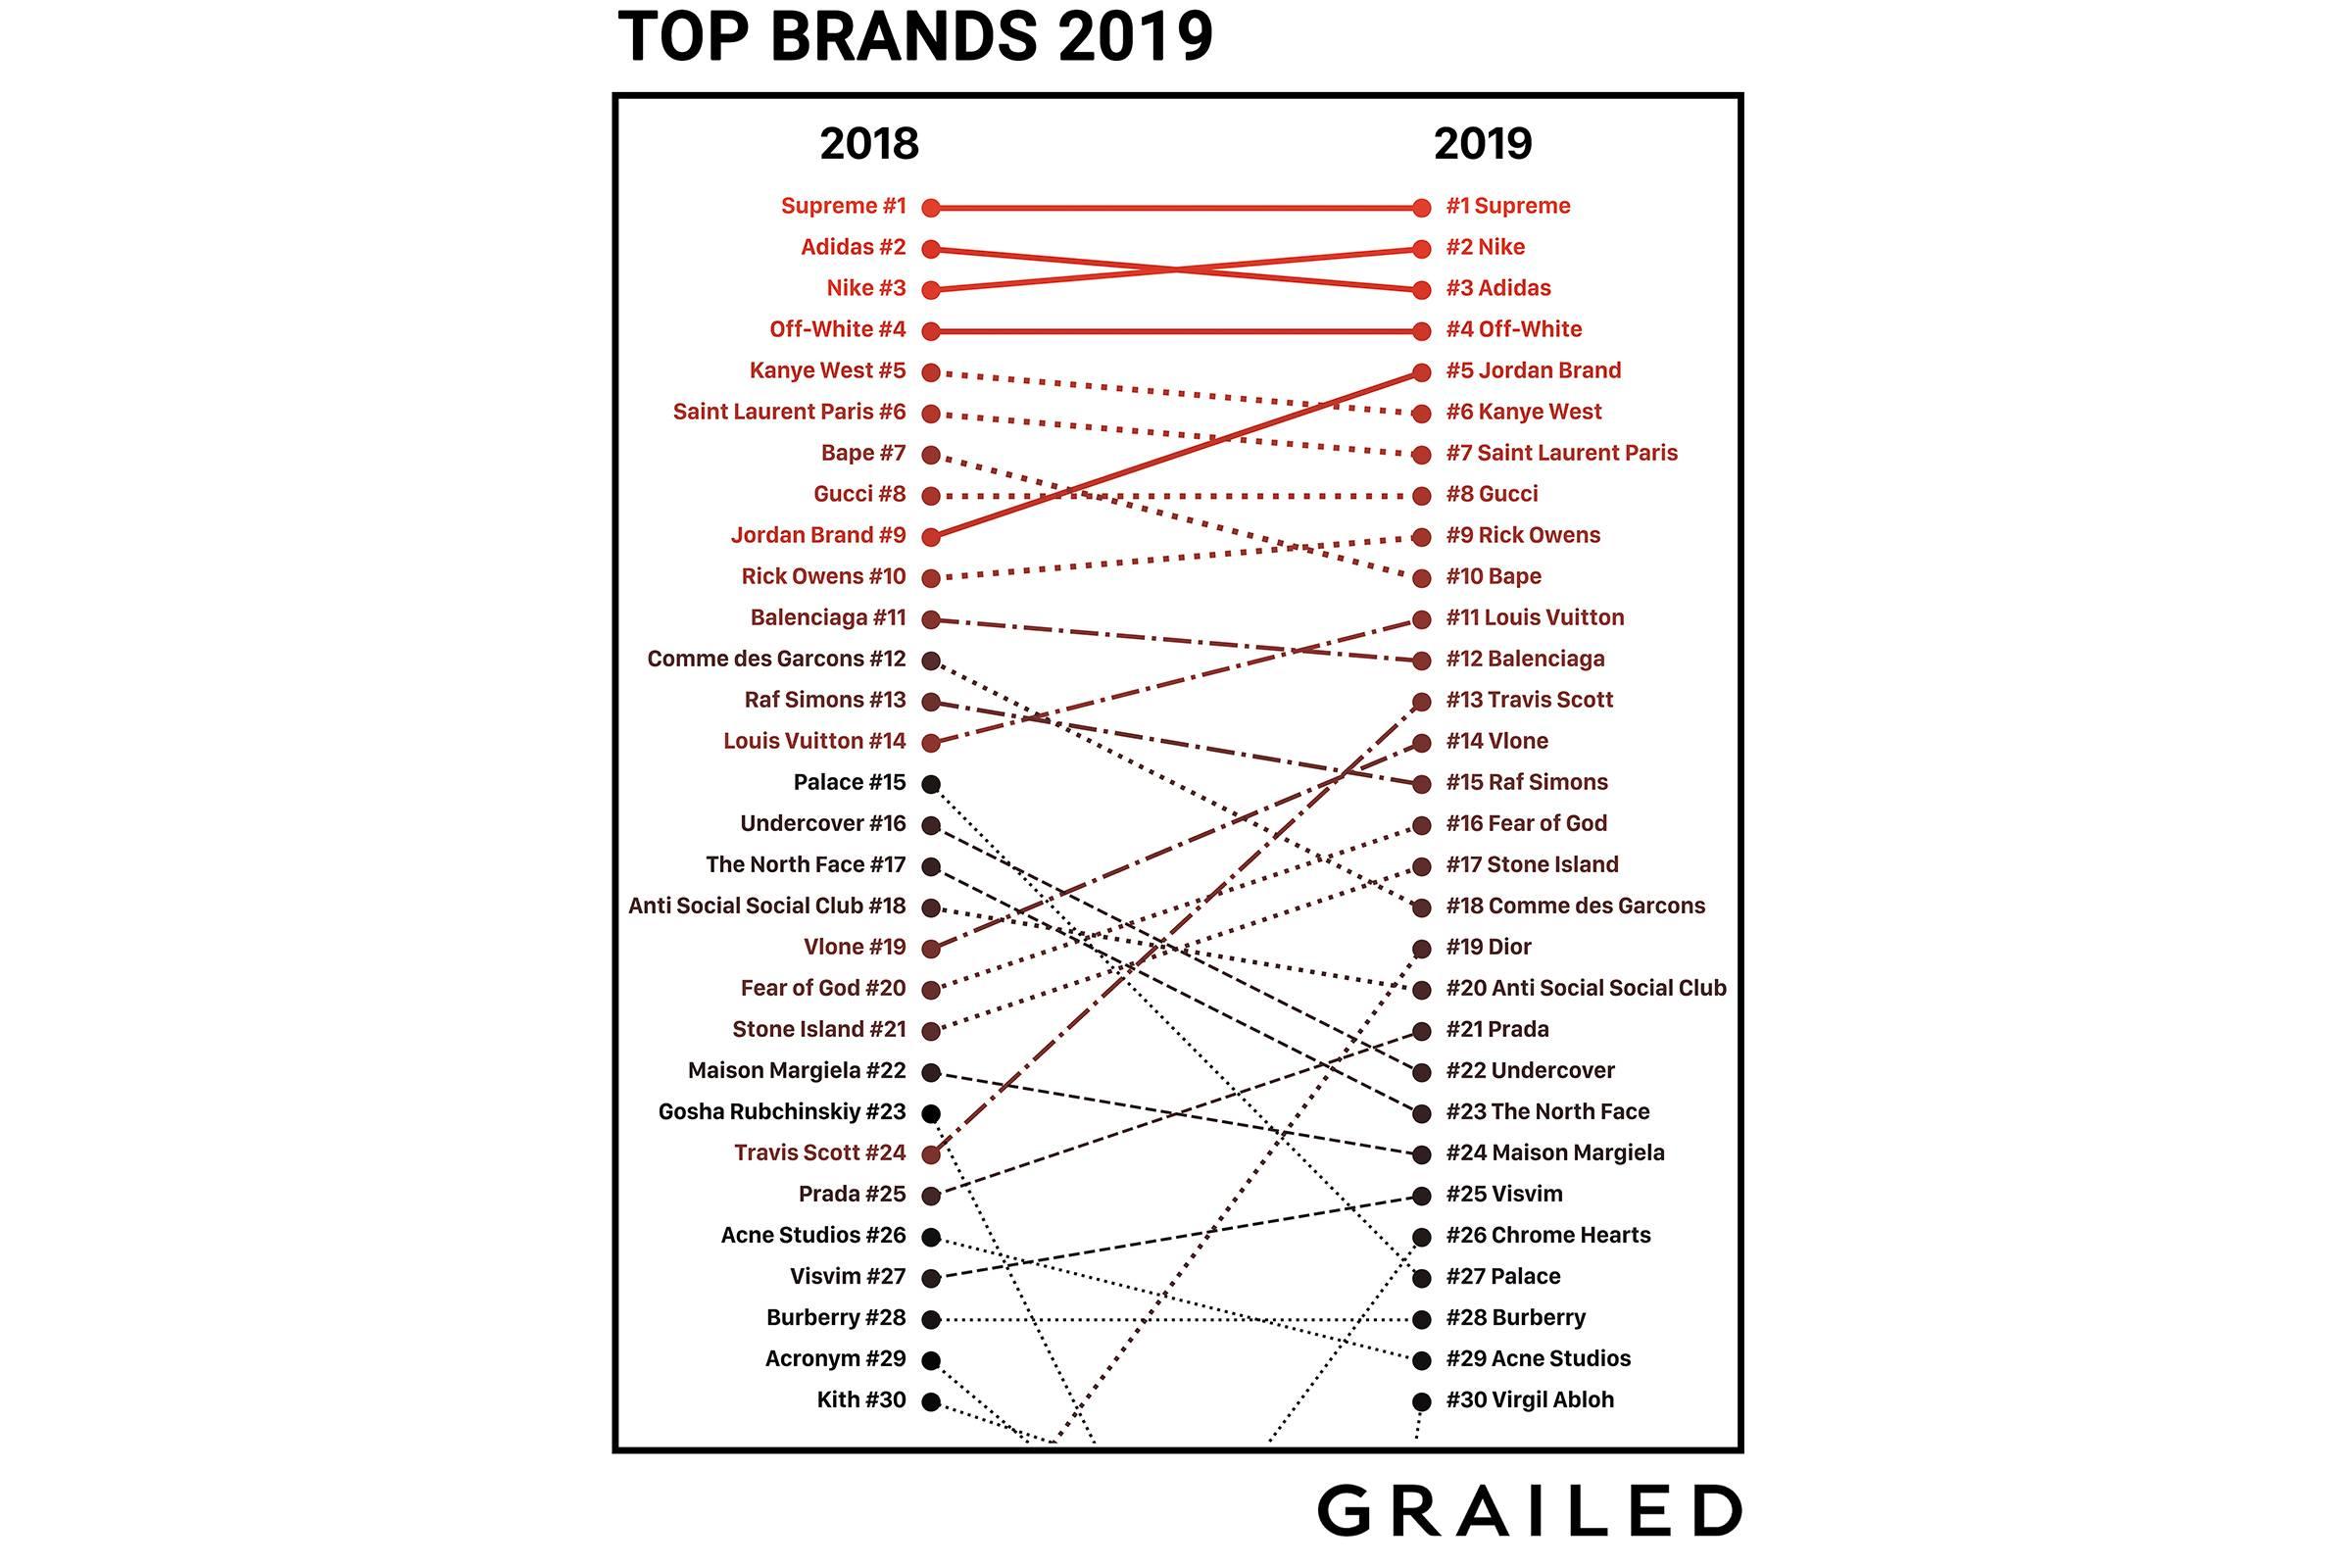 Grailed's Top 30 Brands of 2019